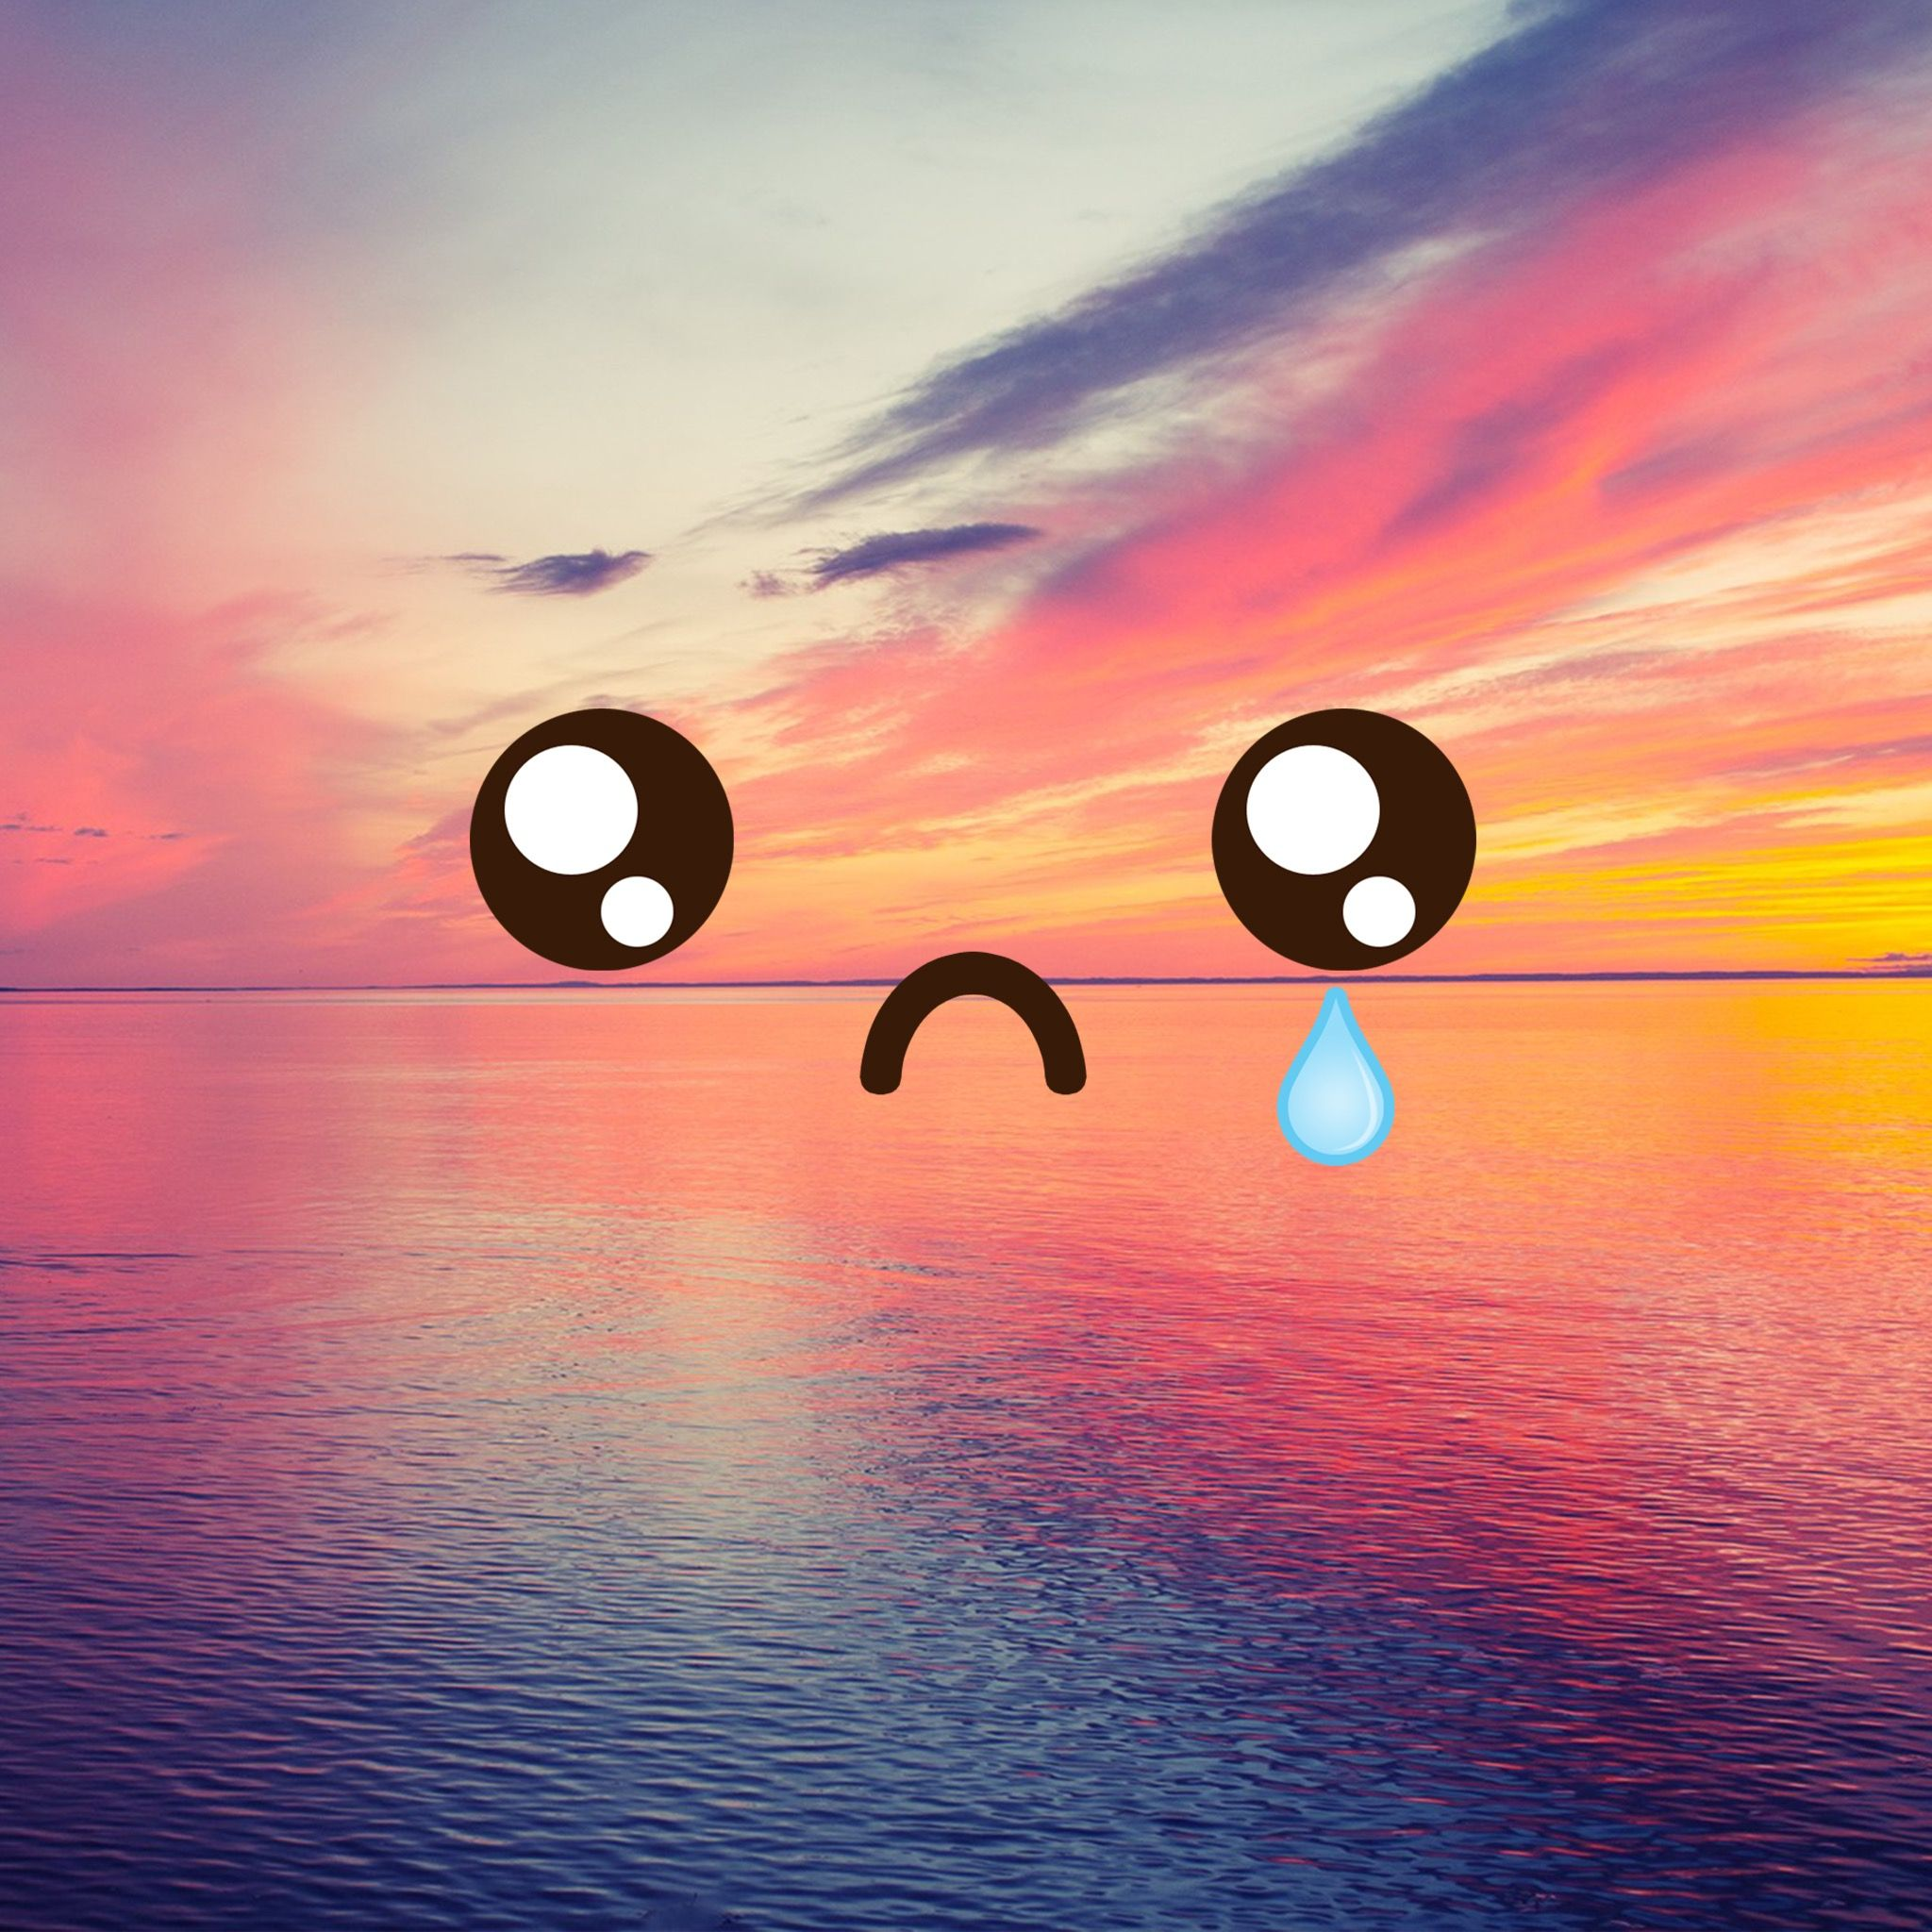 Sad sunset wallpaper